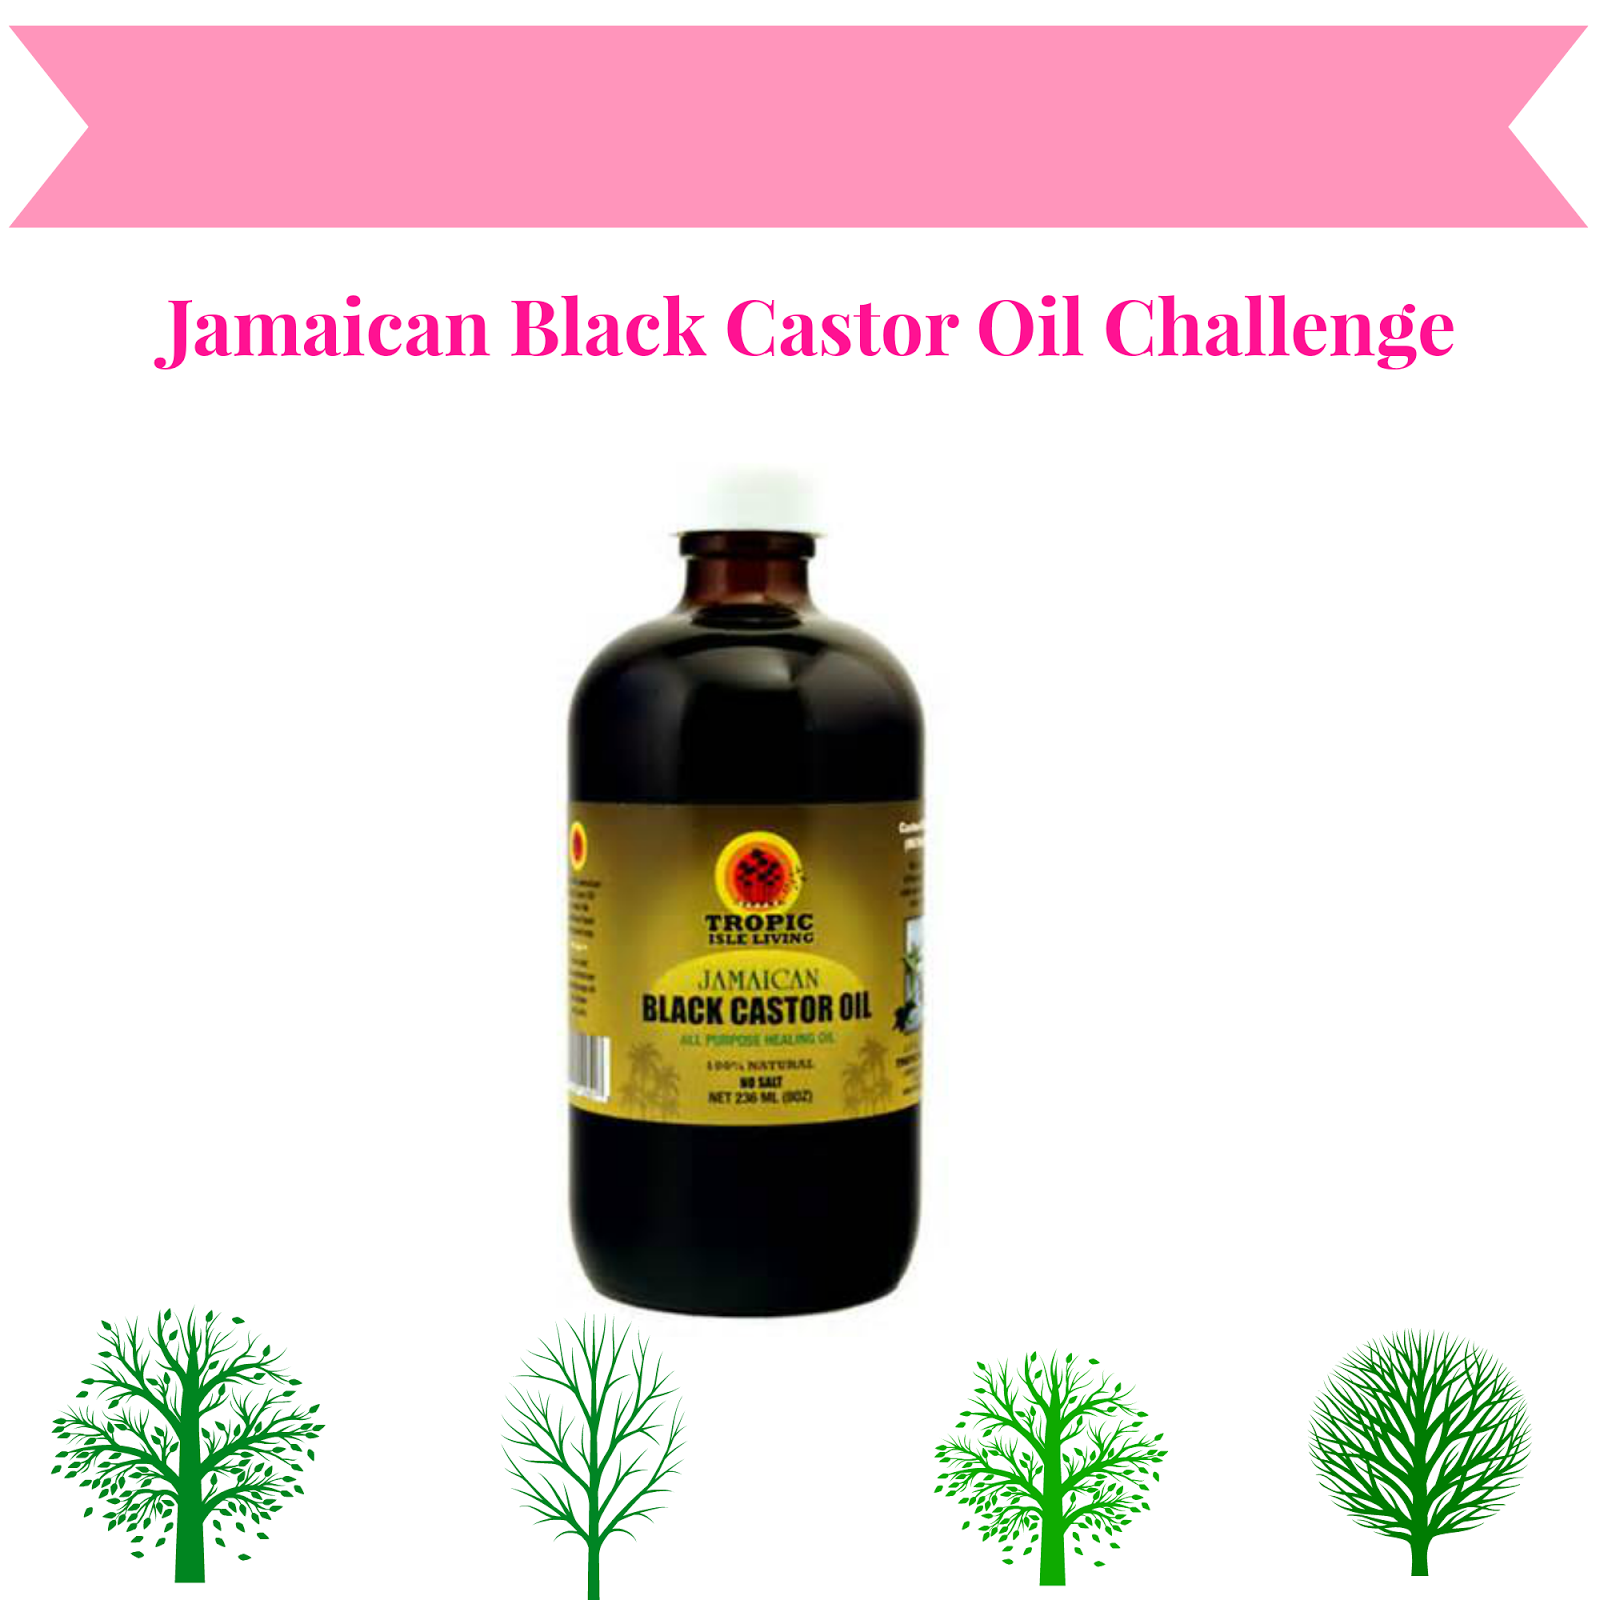 http://www.chicfromhair2toe.com/2012/07/jamaican-black-castor-oil-challenge.html